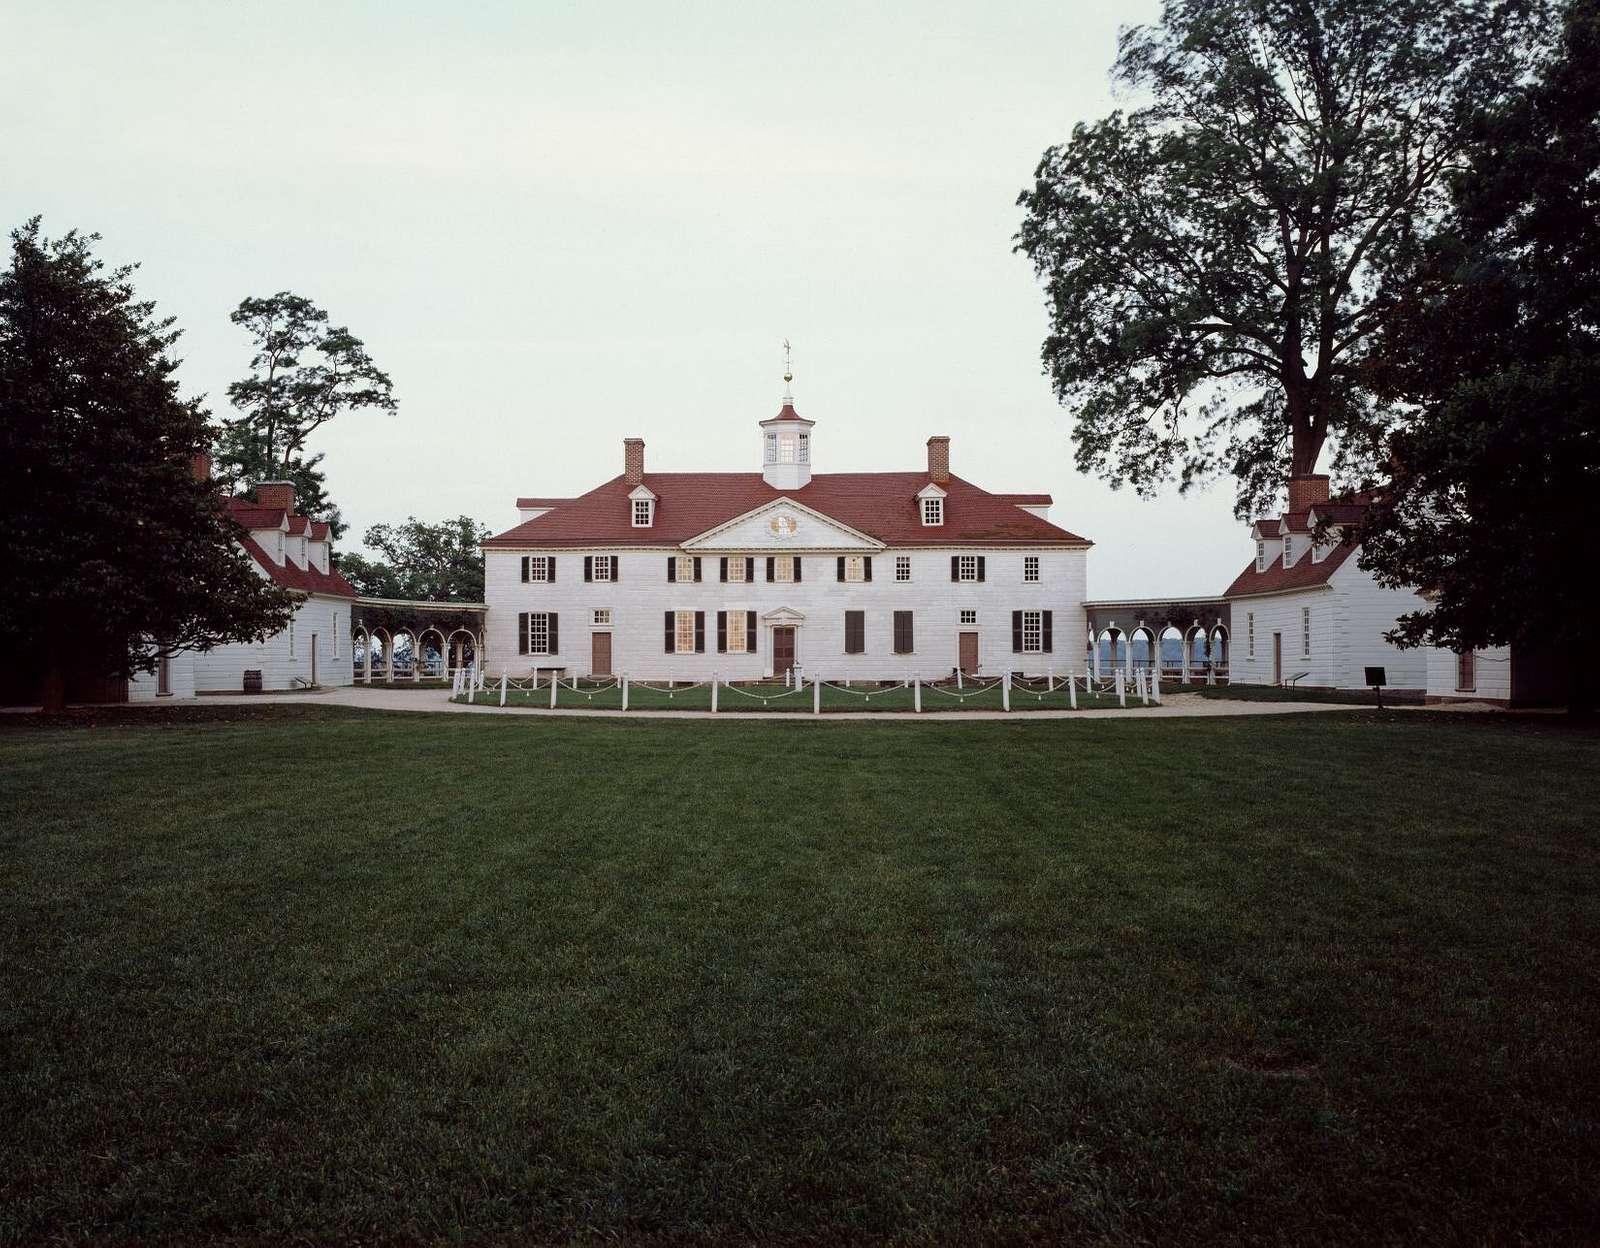 George Washington's estate, Mount Vernon, Virginia